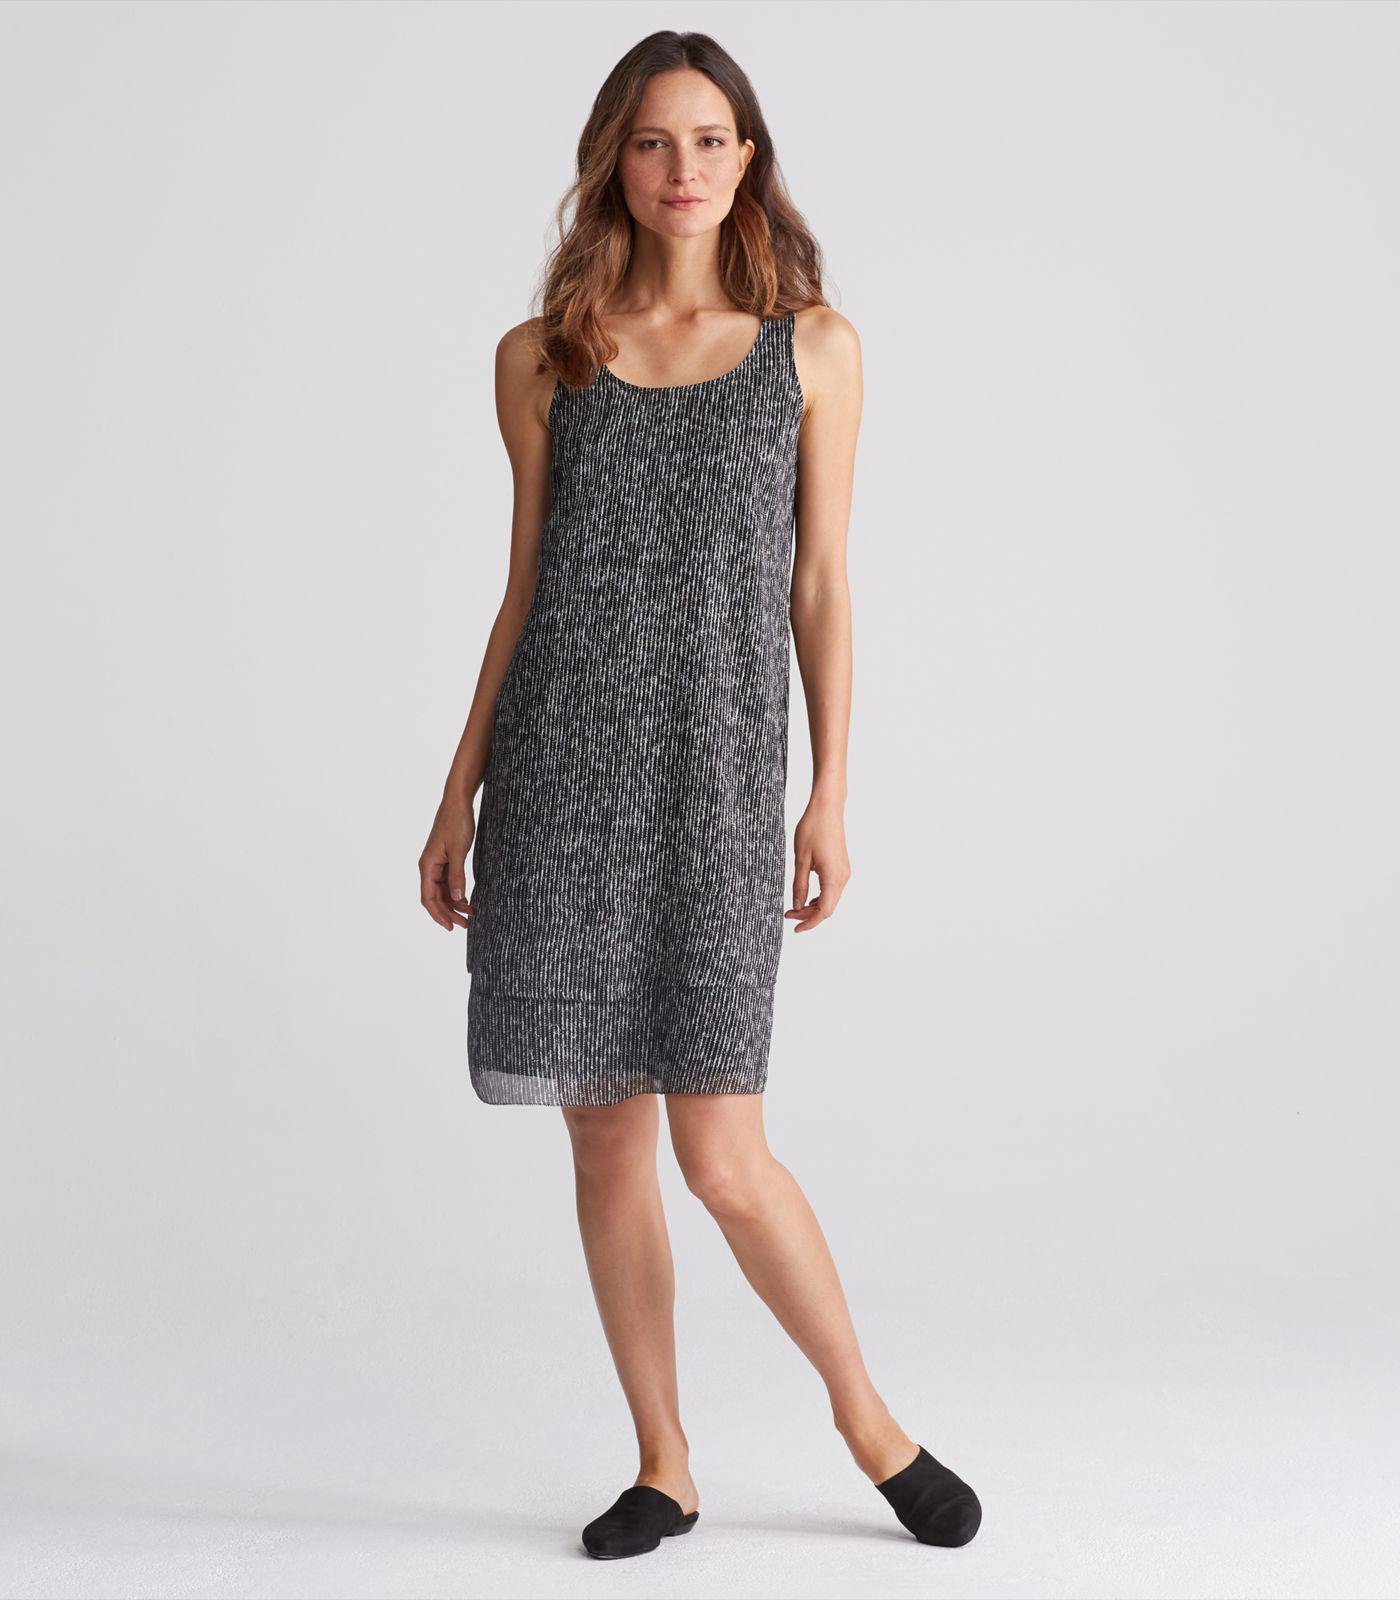 83881a4d615a18 Lyst - Eileen Fisher Elemental Printed Crinkle Silk Scoop Neck Knee ...